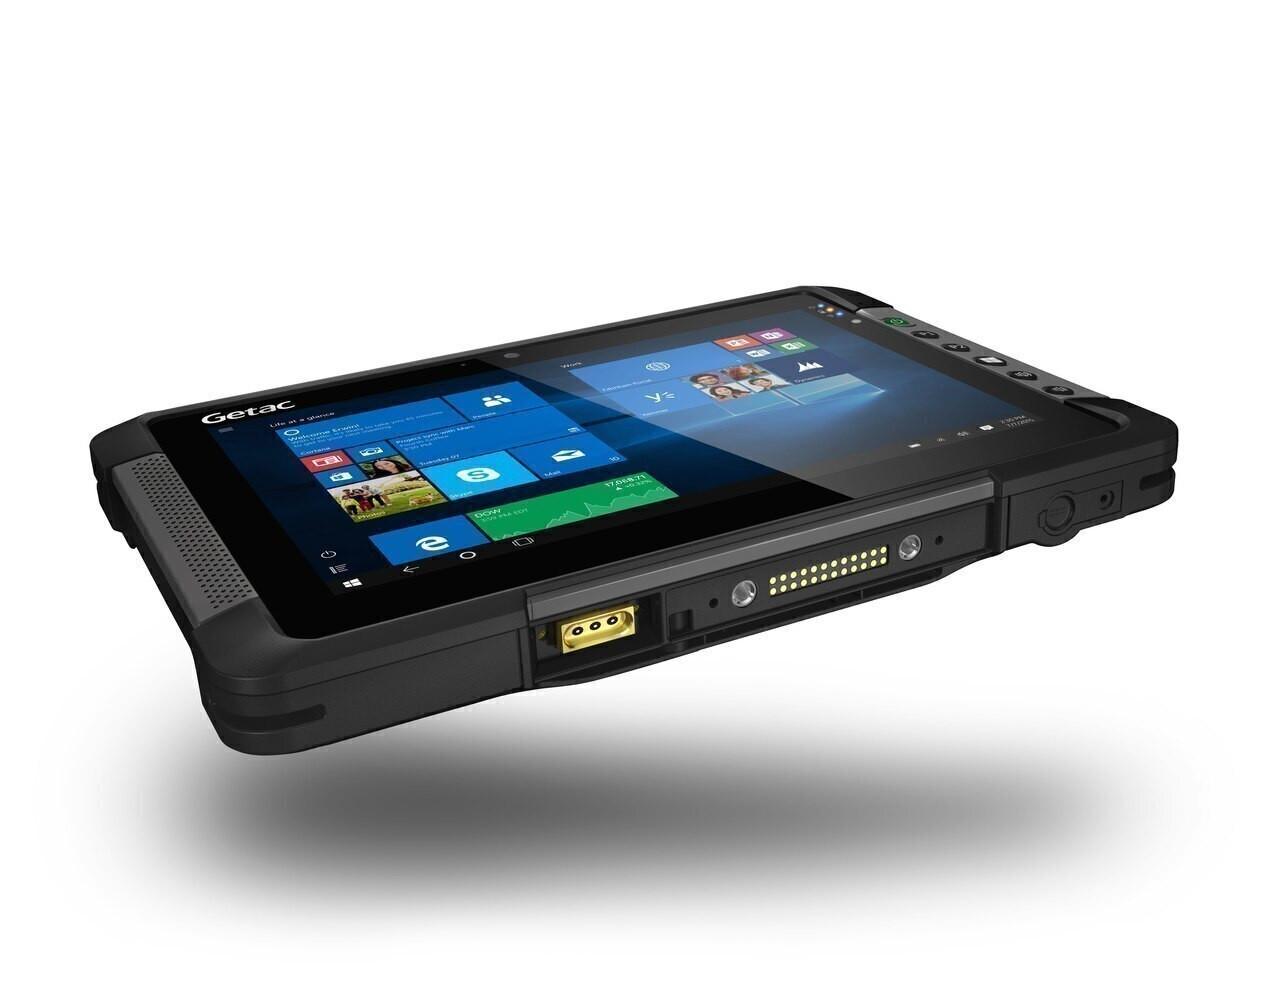 "Getac T800 G2 Premium USA,Intel Atom Processor x7-Z8750,8.1""+Webcam, Win10 Pro x64 with 8GB RAM ,128GB eMMC,Sunlight Readable (LCD+Touchscreen),US Power cord,8M Rear Camera,WIFI+ BT + GPS+ 4G LTE (US/EU) + Pass-through,Barcode Reader ,TPM 2.0"